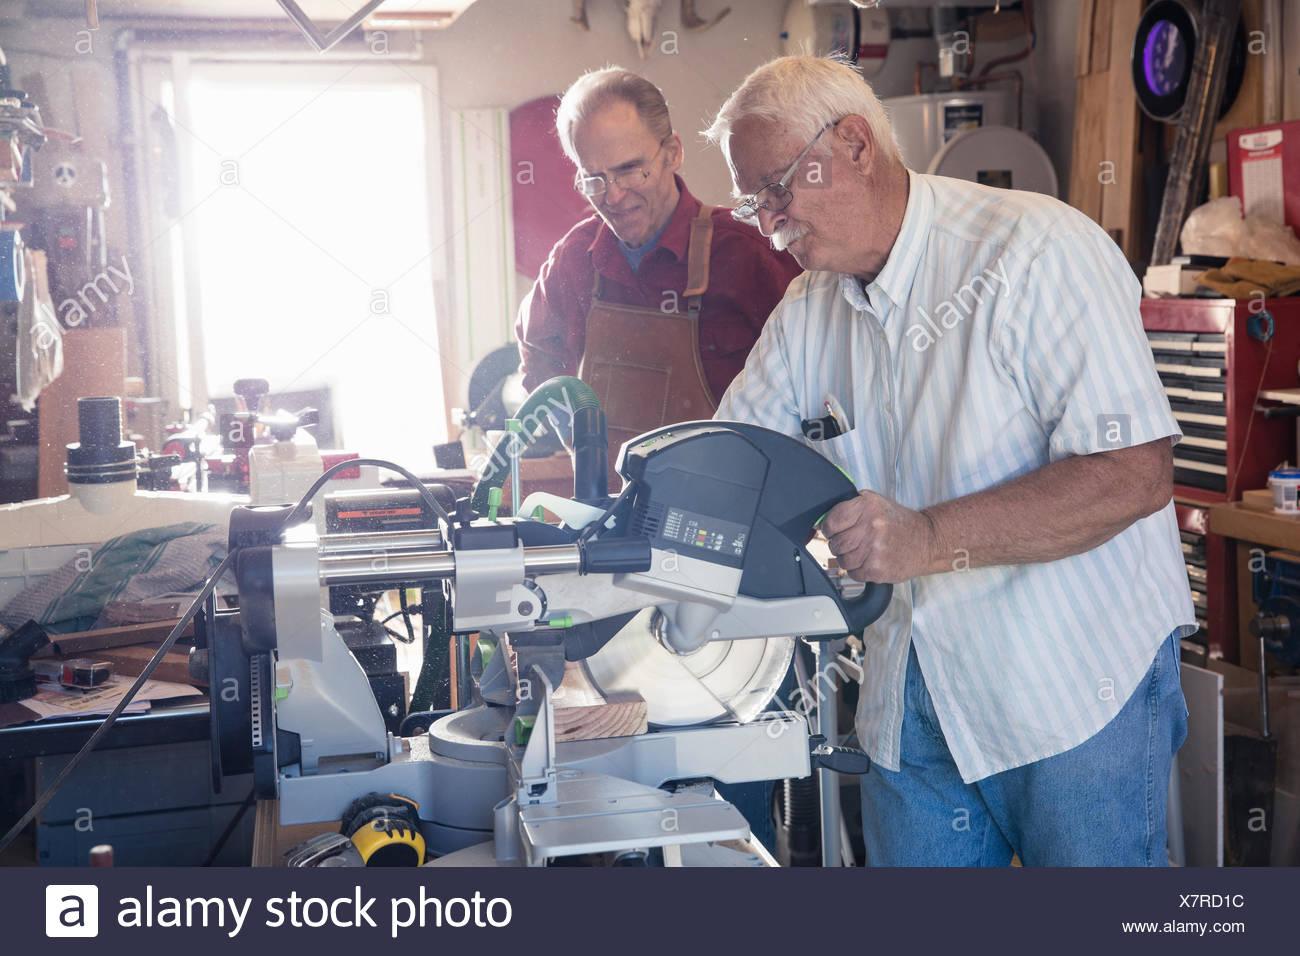 Senior men sawing woodblock in carpentry workshop - Stock Image